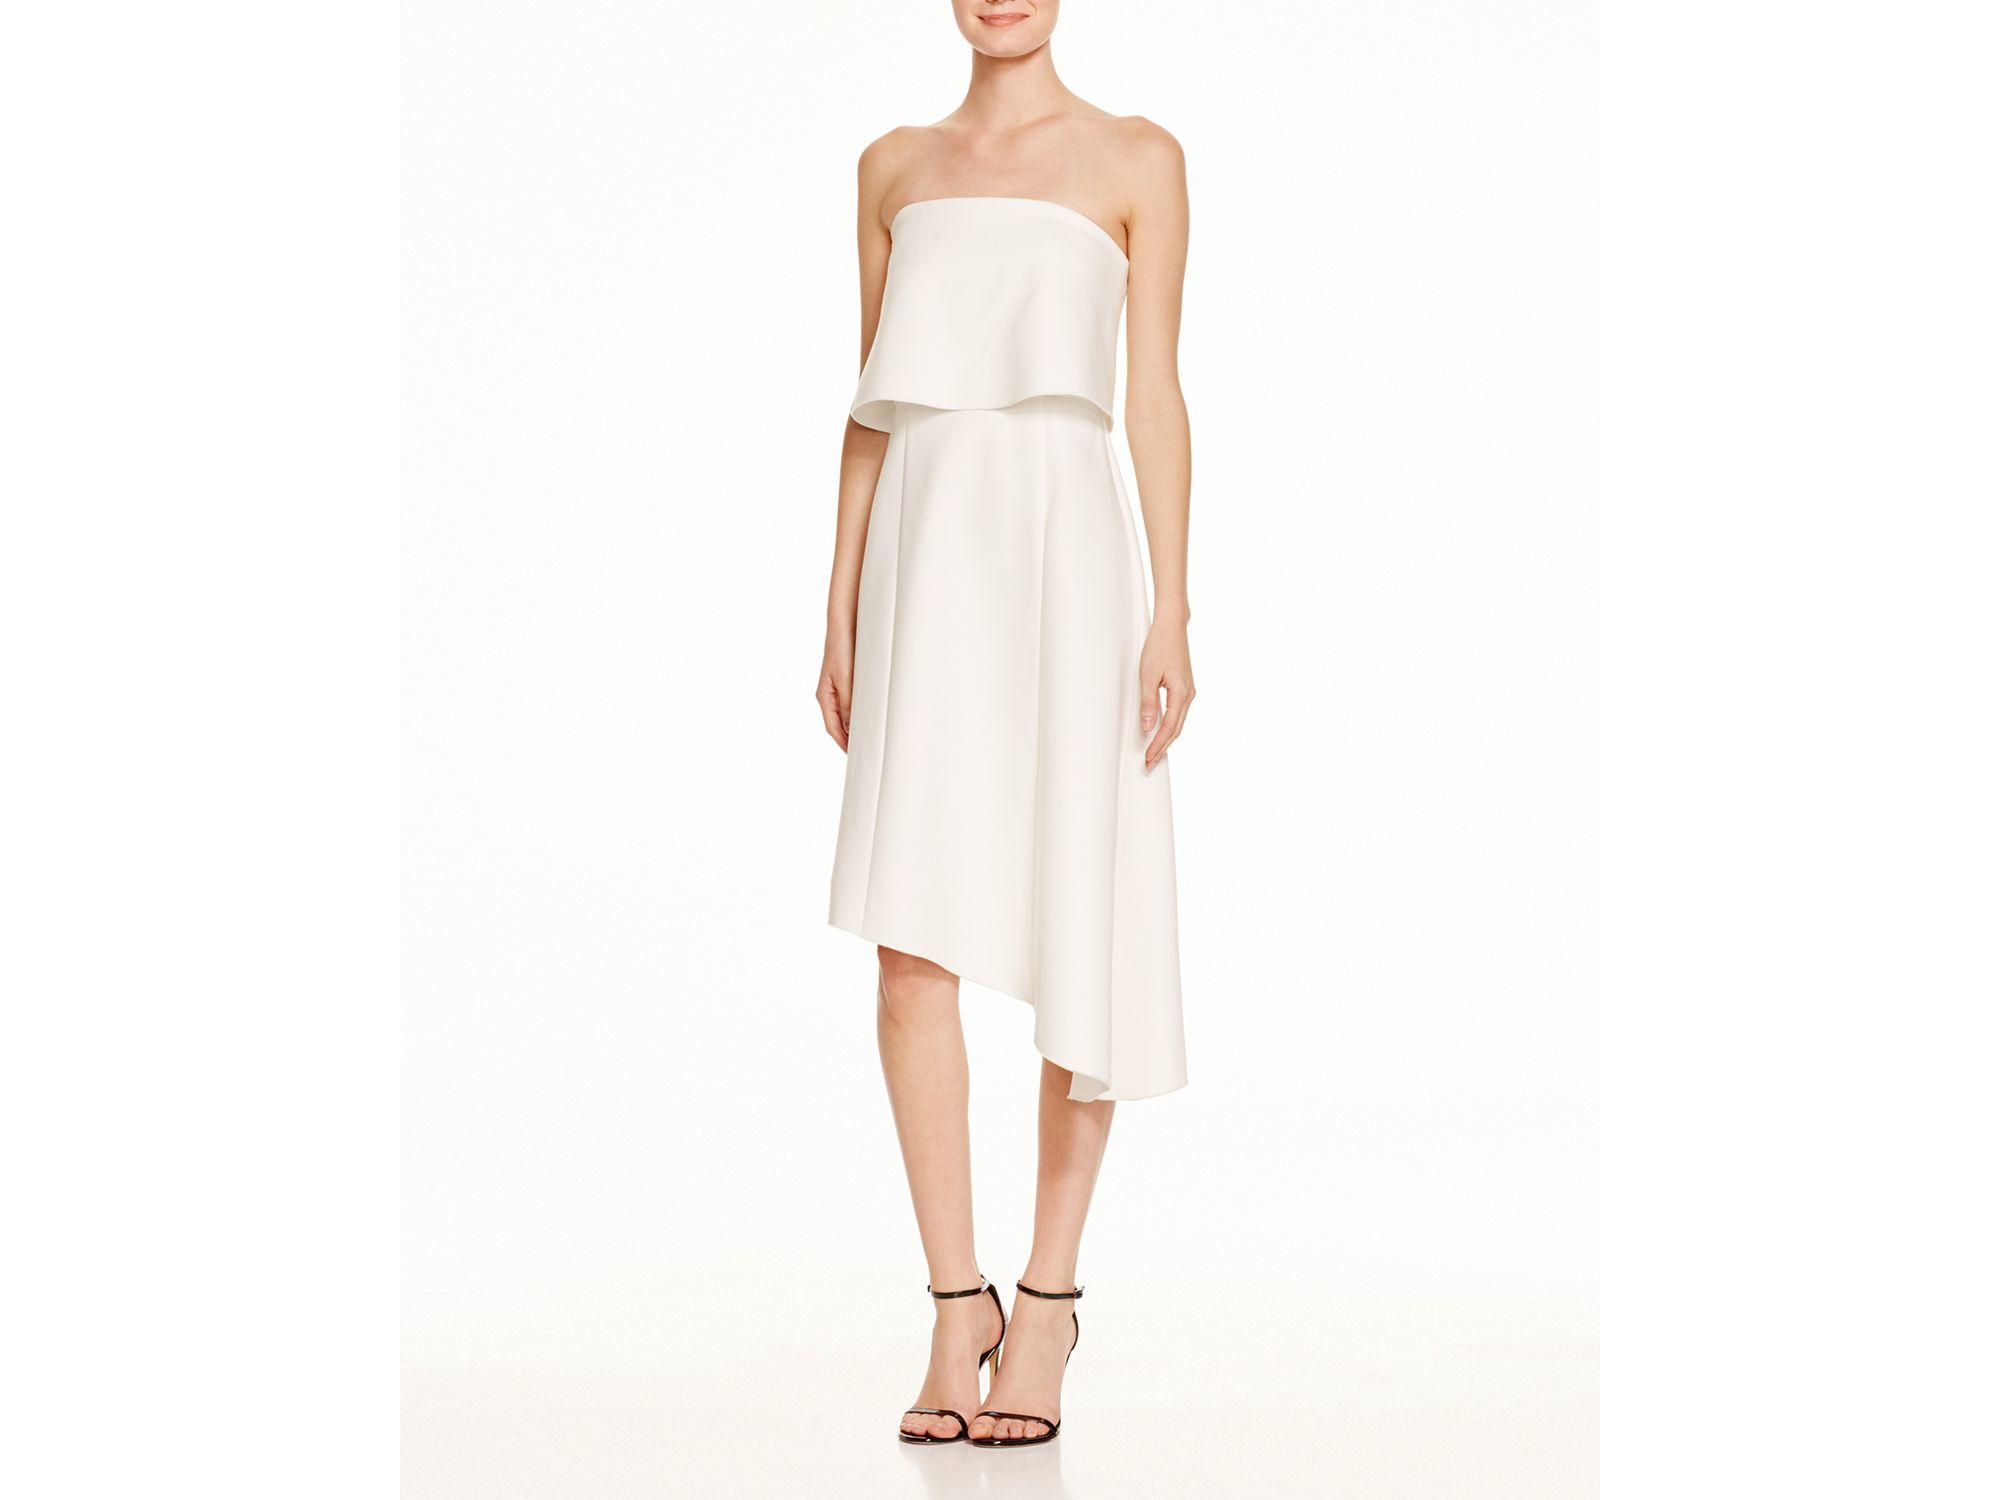 7e3126365c33f N Nicholas Strapless Overlay Dress in White - Lyst